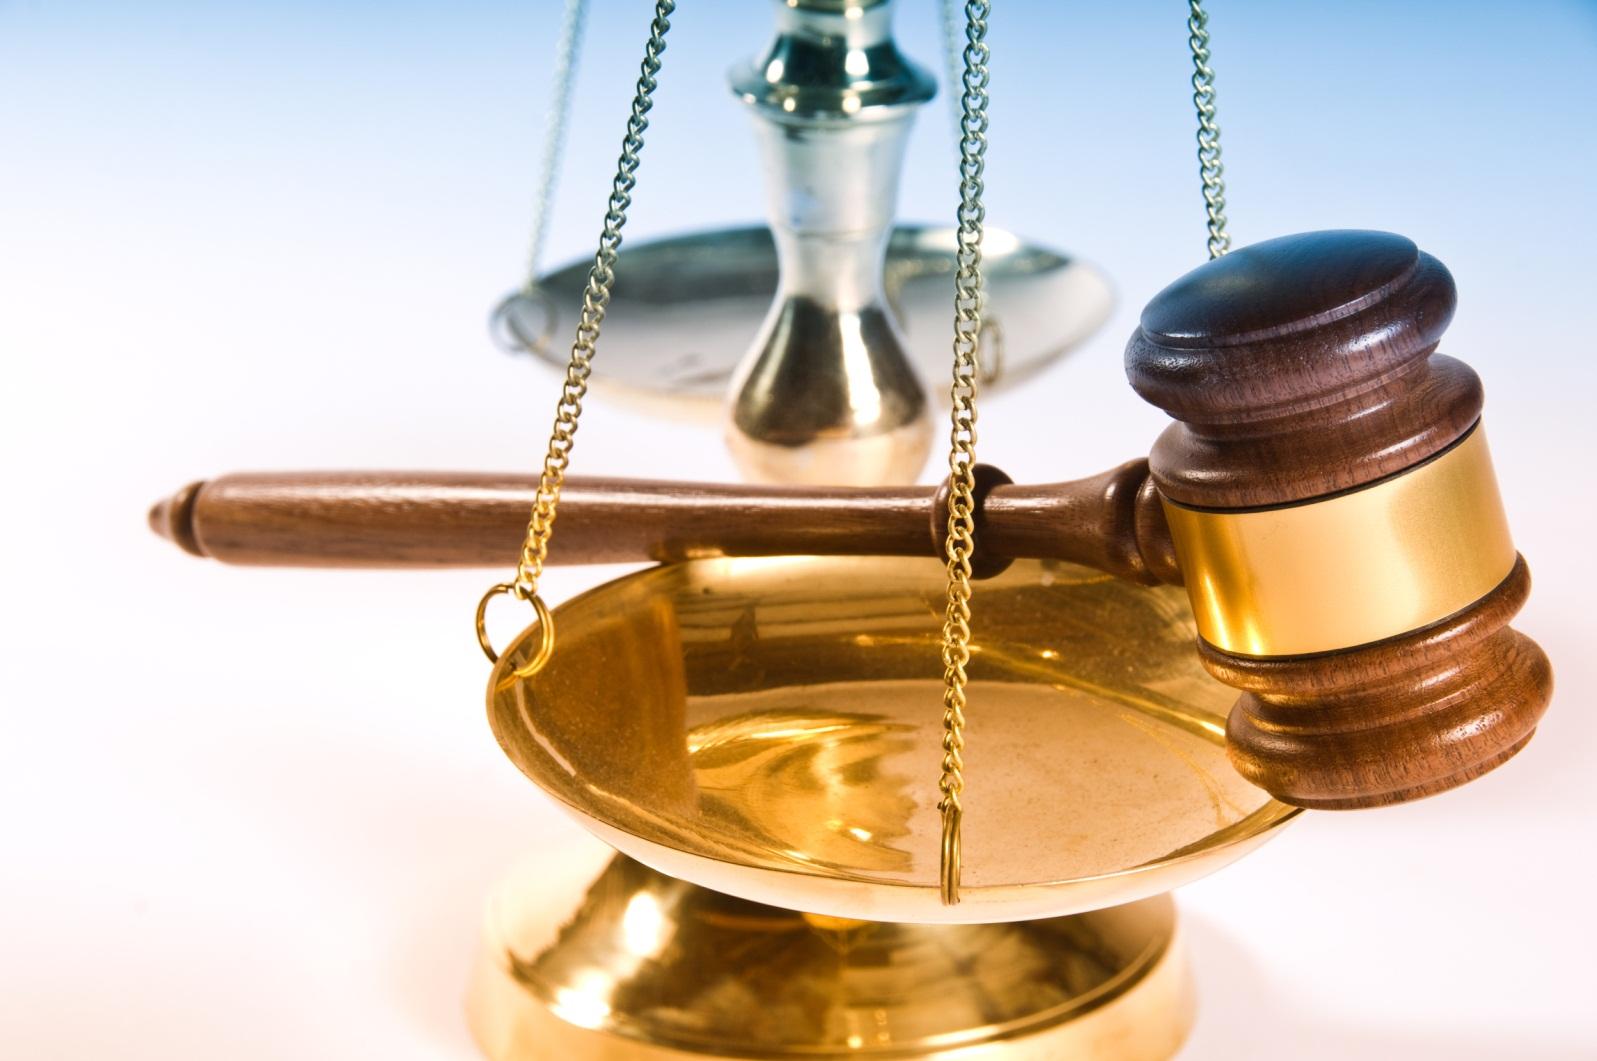 http://unitelive.org/wp-content/uploads/2015/04/tribunal.jpg